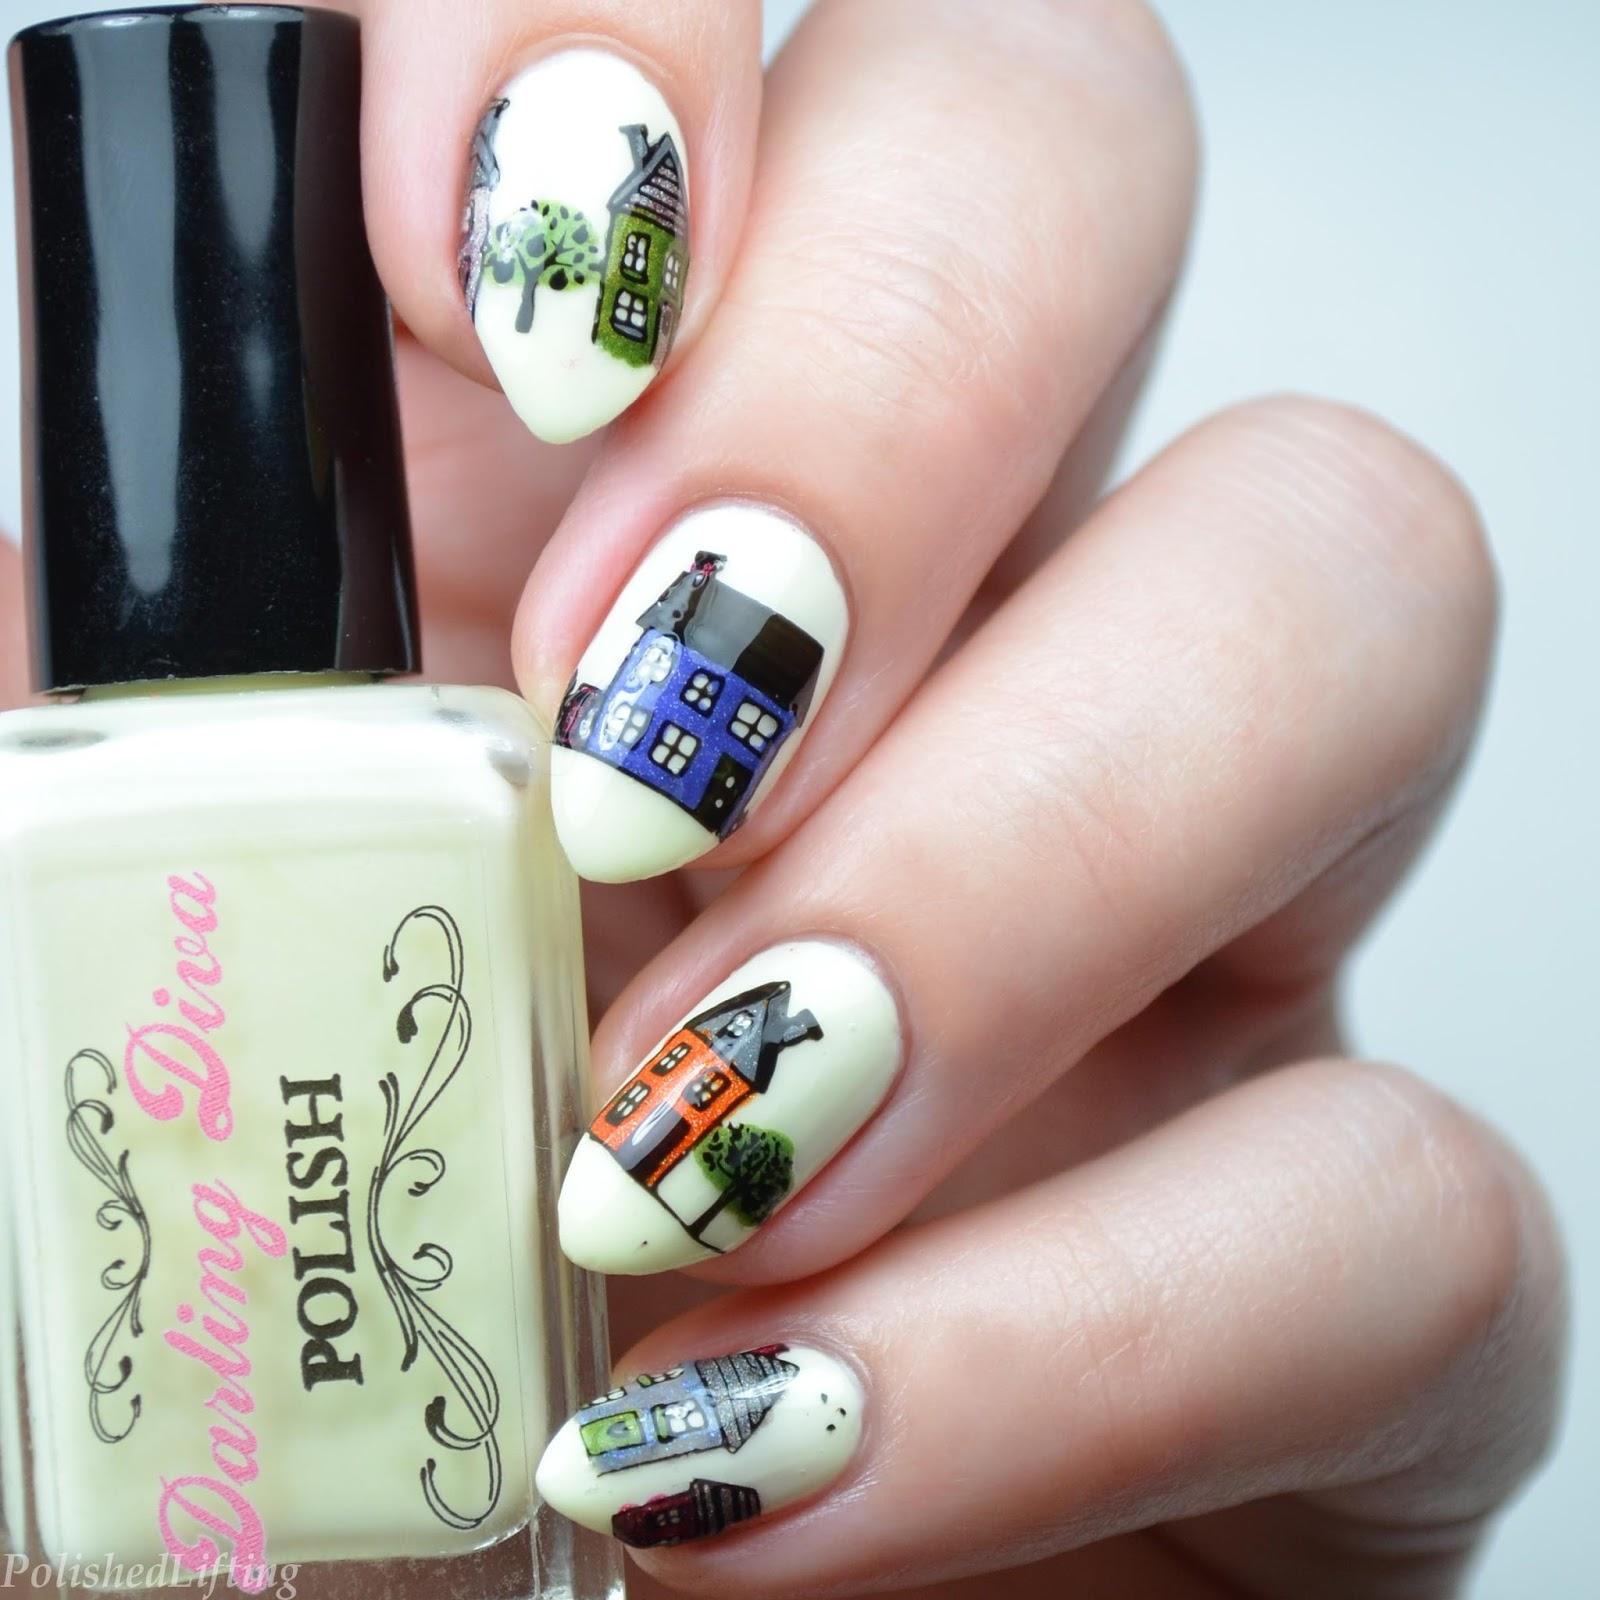 Polished lifting city nail art featuring moyou london city themed nail art prinsesfo Gallery